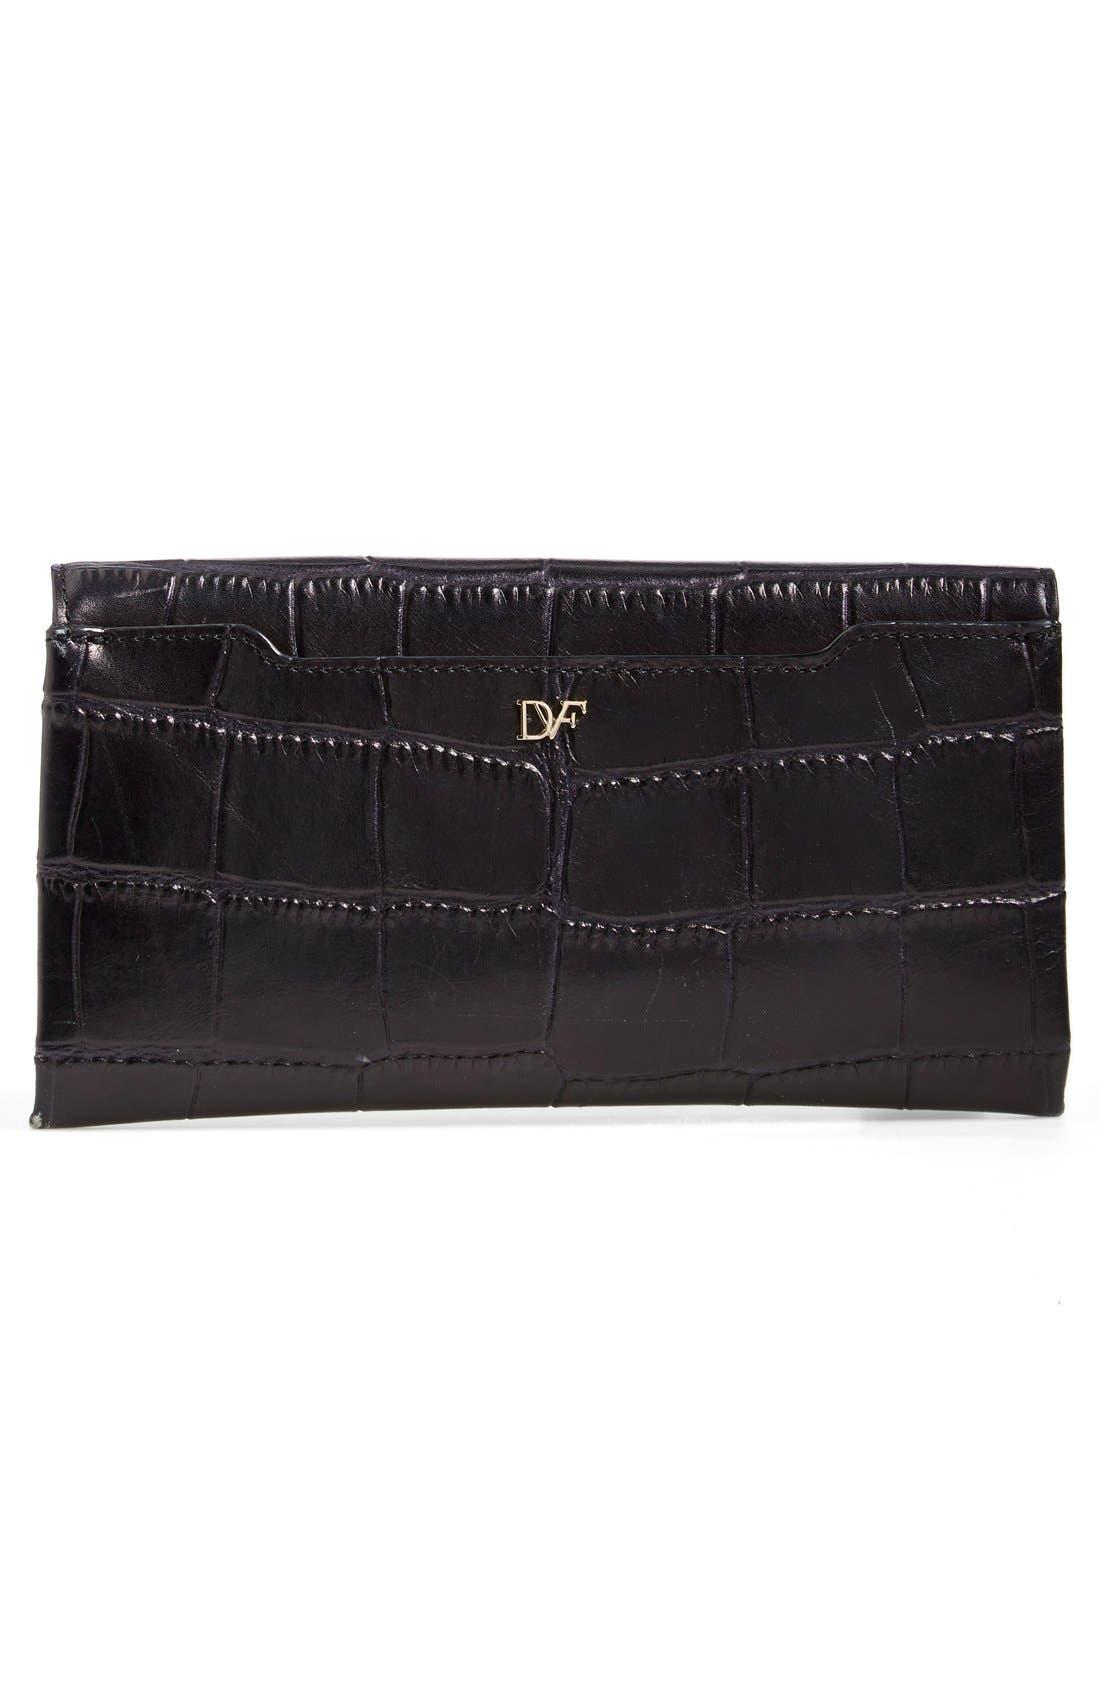 Alternate Image 3  - Diane von Furstenberg '440' Croc-Embossed Leather Envelope Clutch